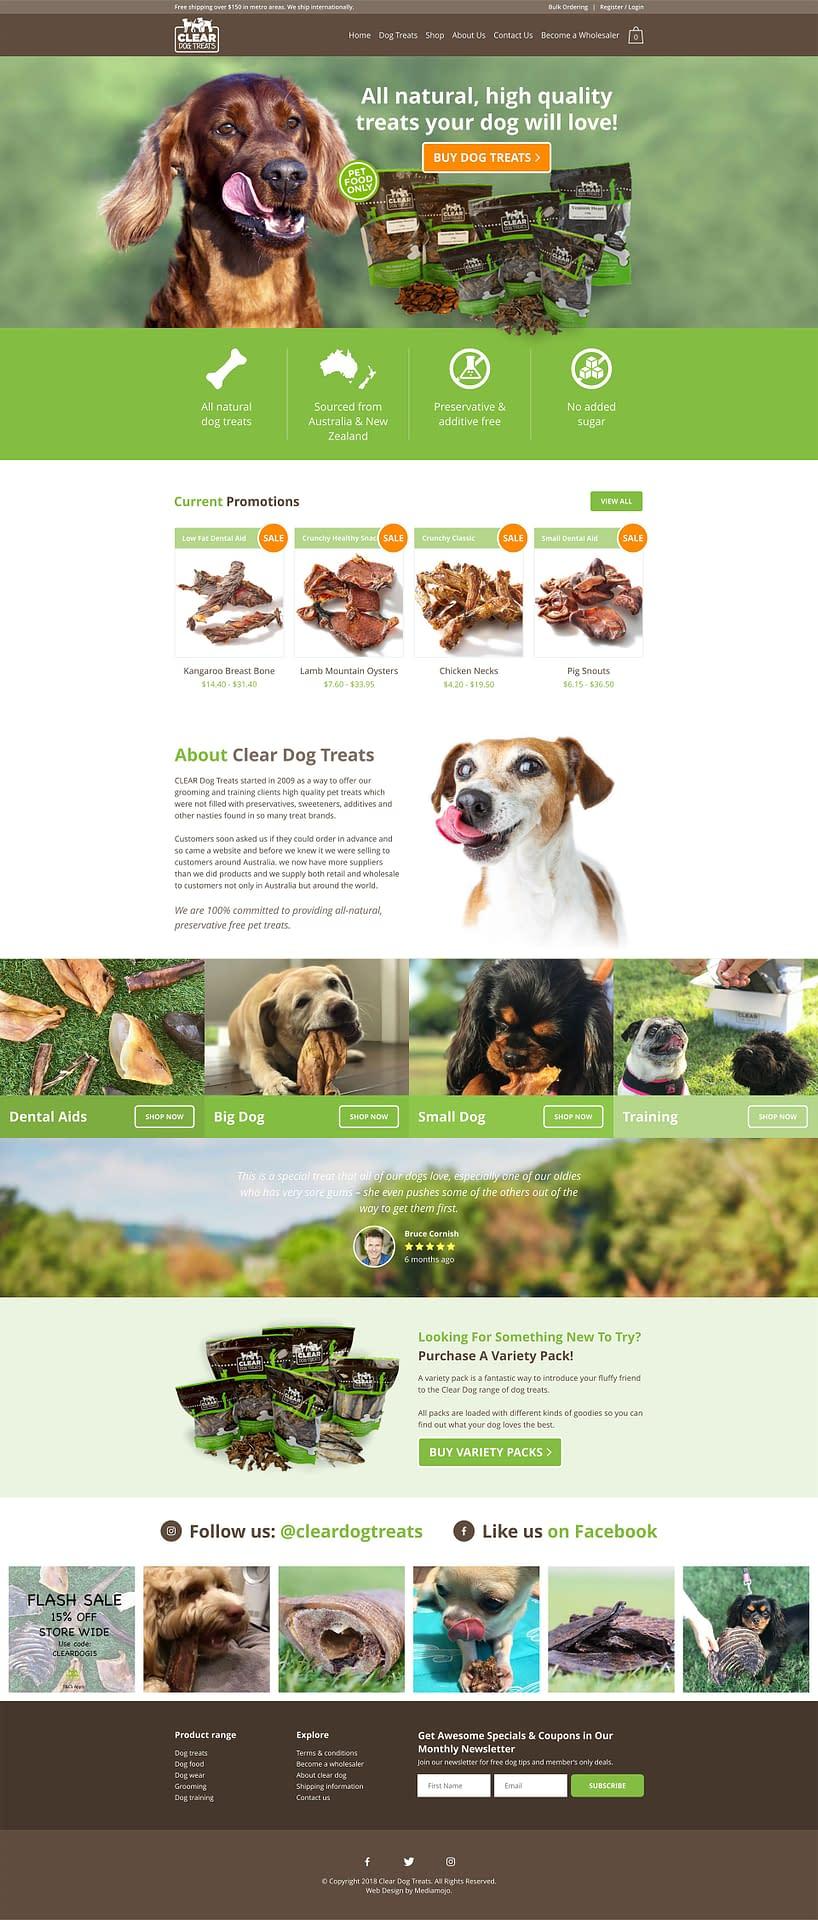 Clear dog treats website design